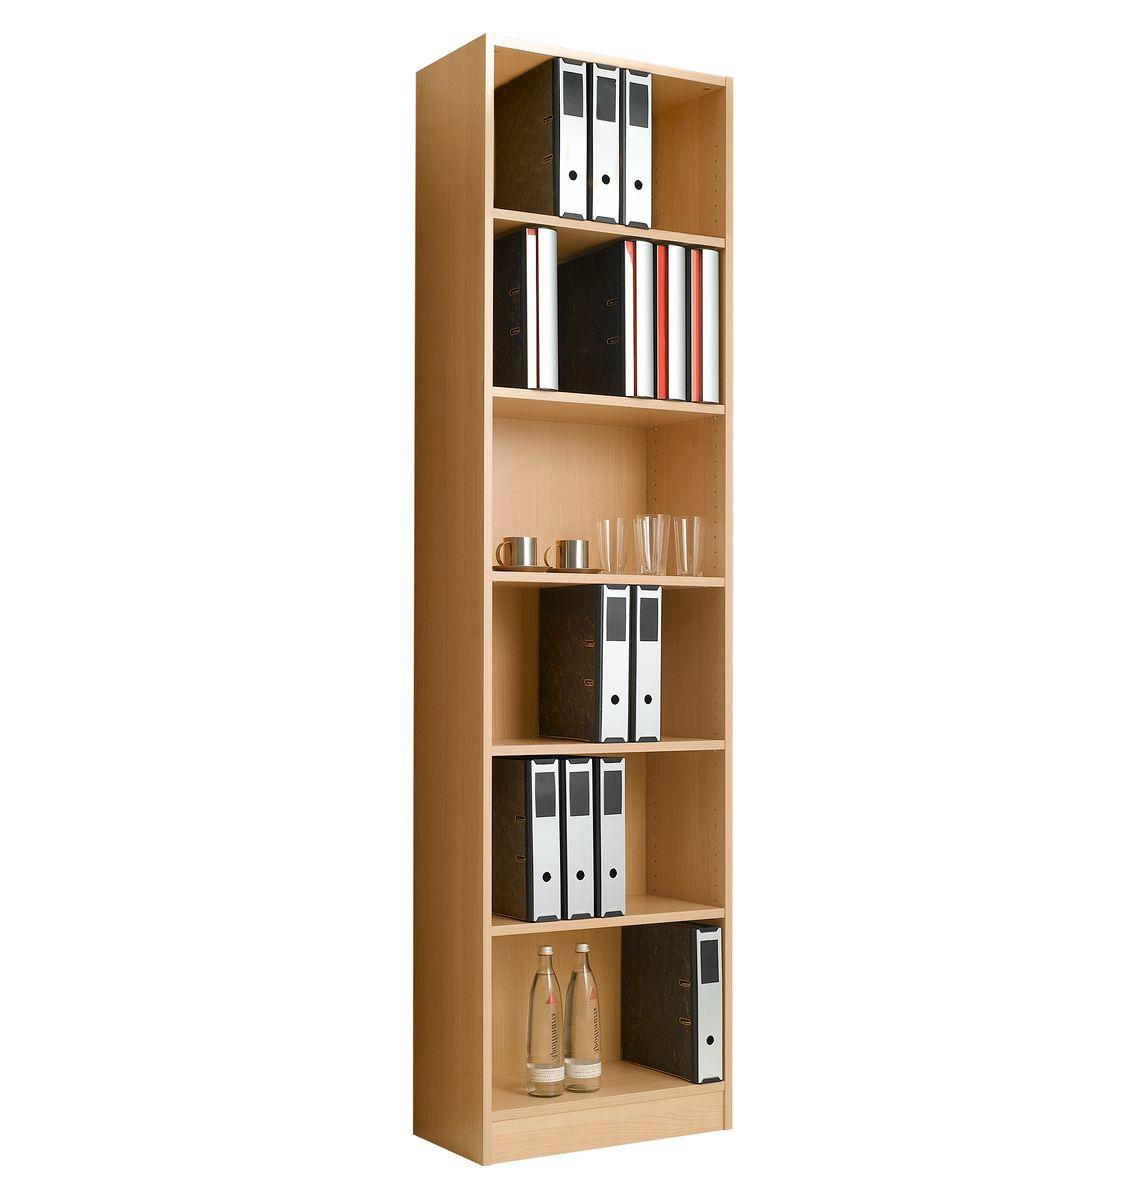 regal tombo hoch schmal b 600 mm g nstig kaufen sch fer shop. Black Bedroom Furniture Sets. Home Design Ideas